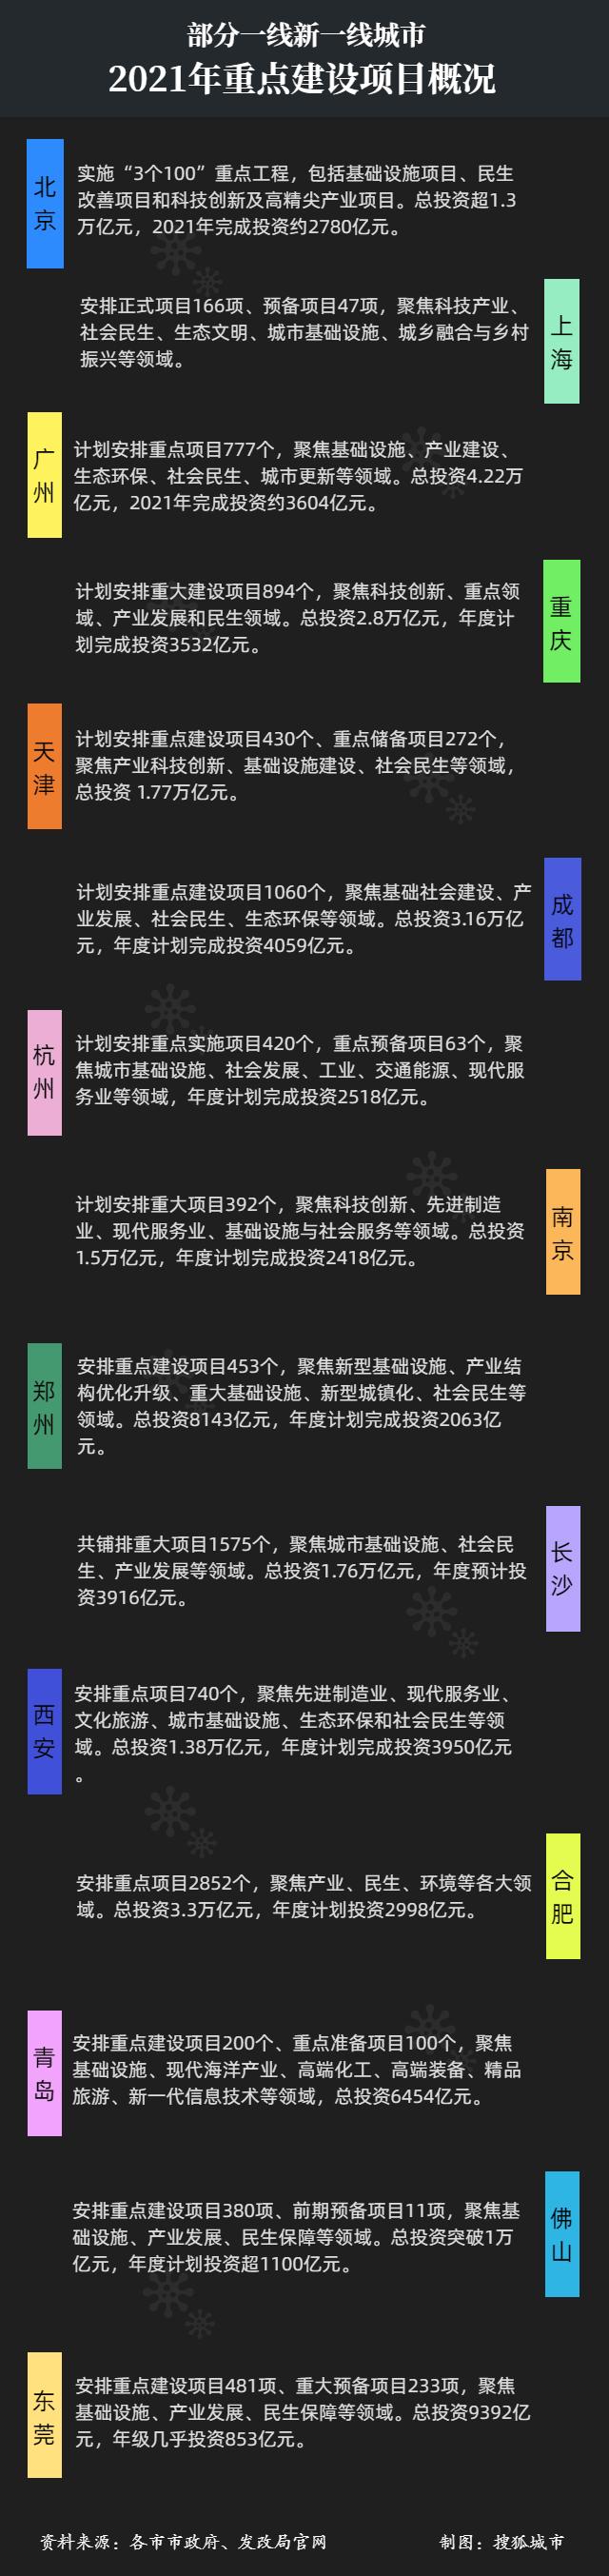 赢咖4测速-首页【1.1.8】